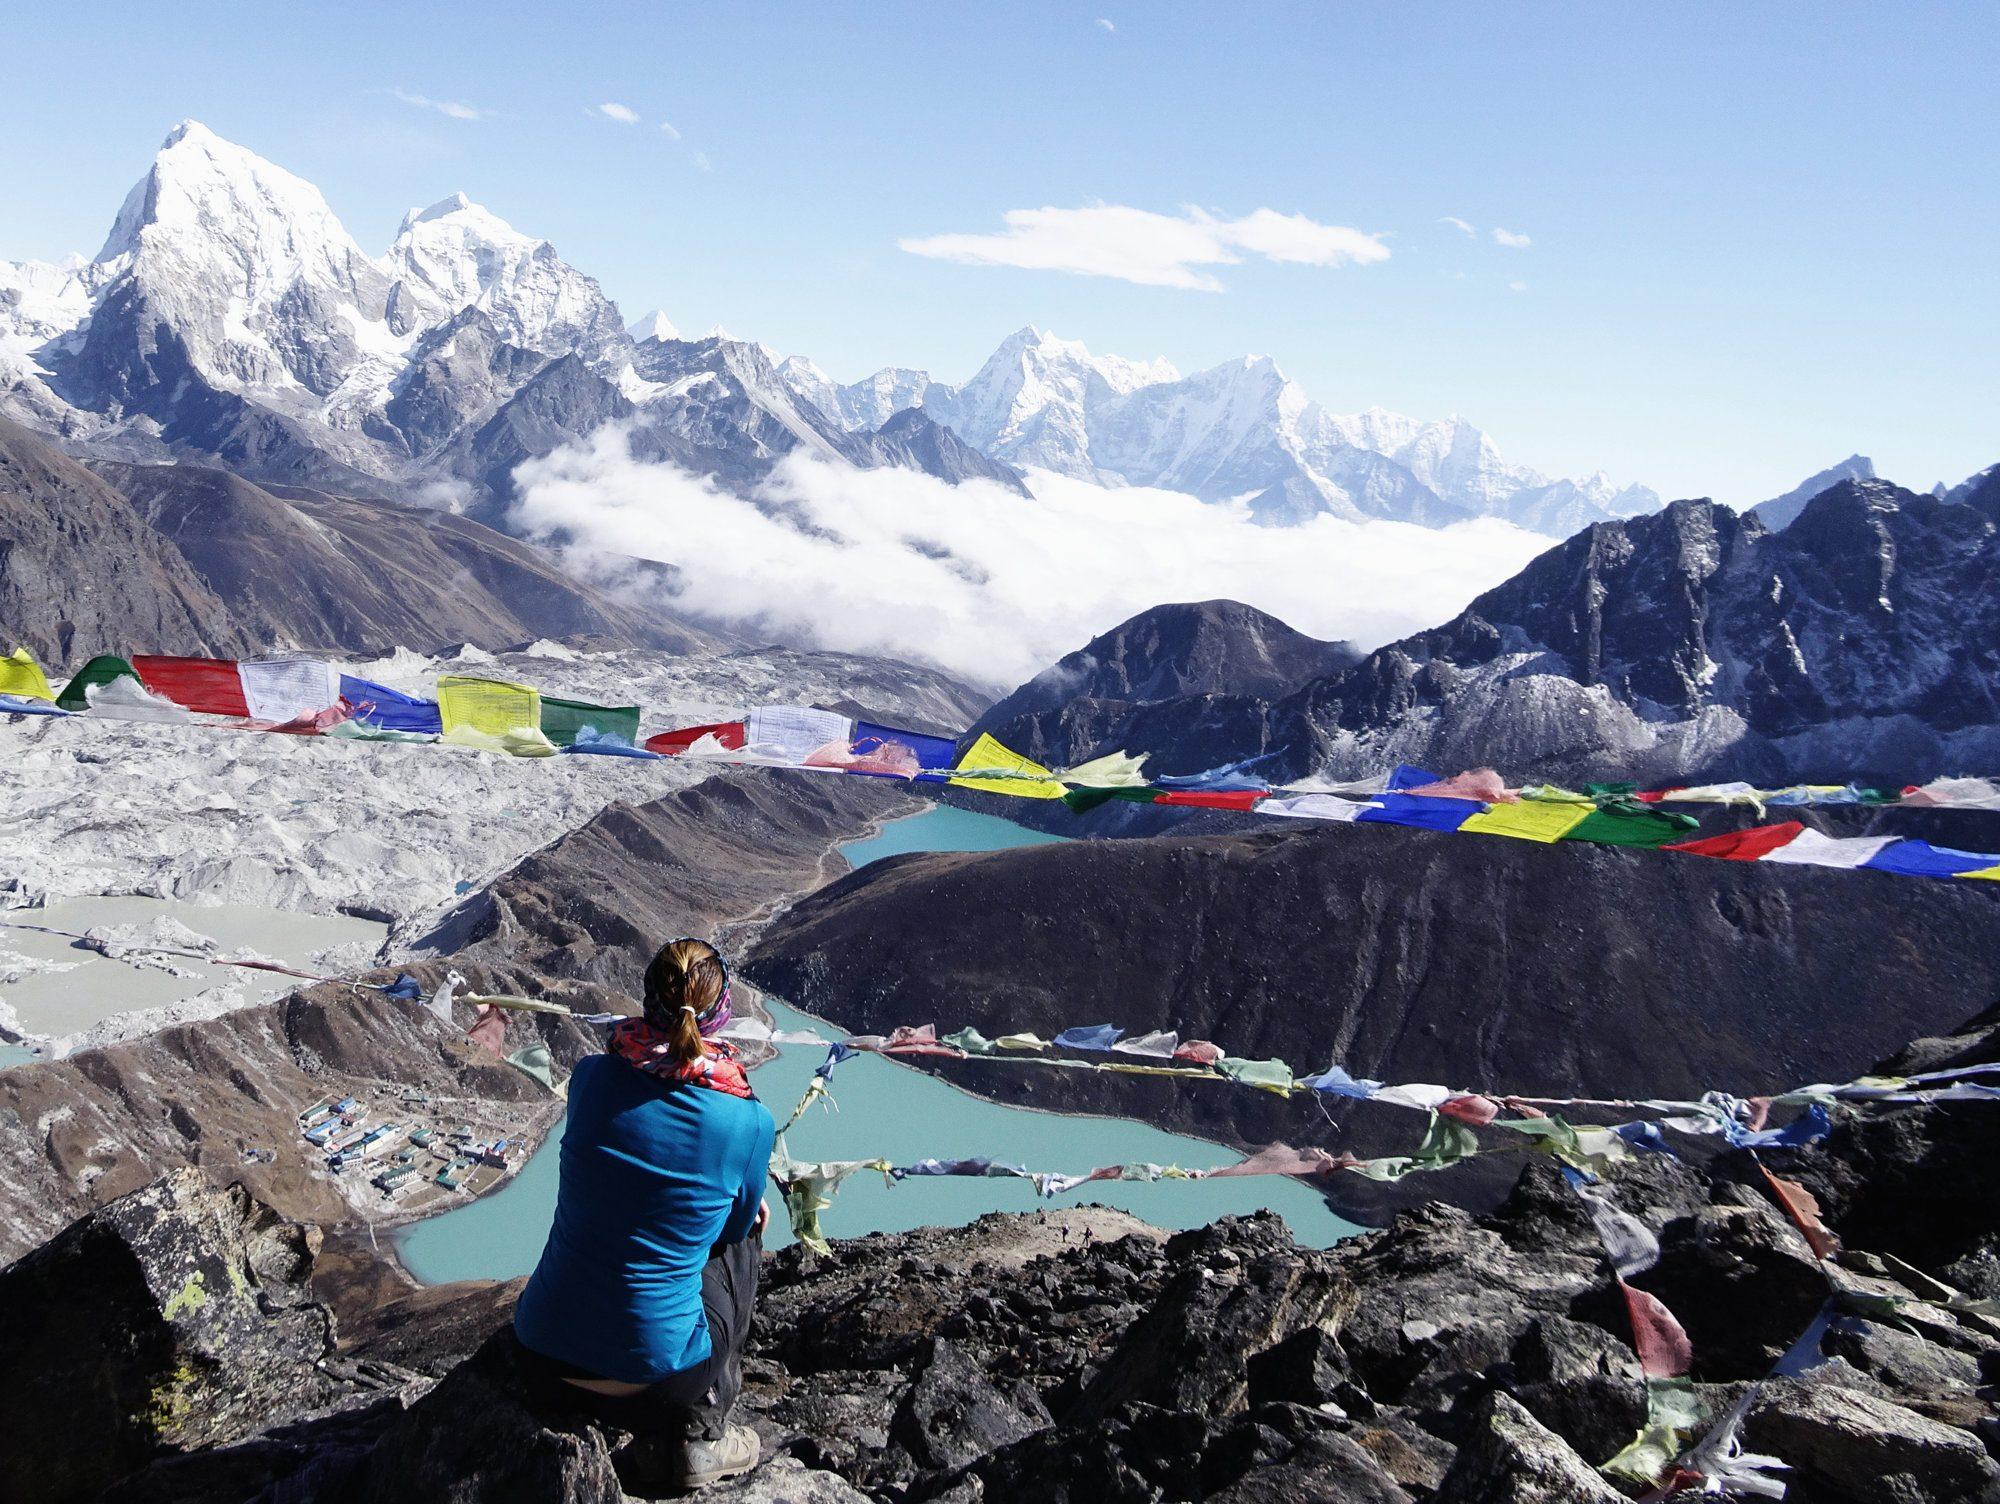 Nepal Everest Trek, Gokyo Ri, Gokyo Seen